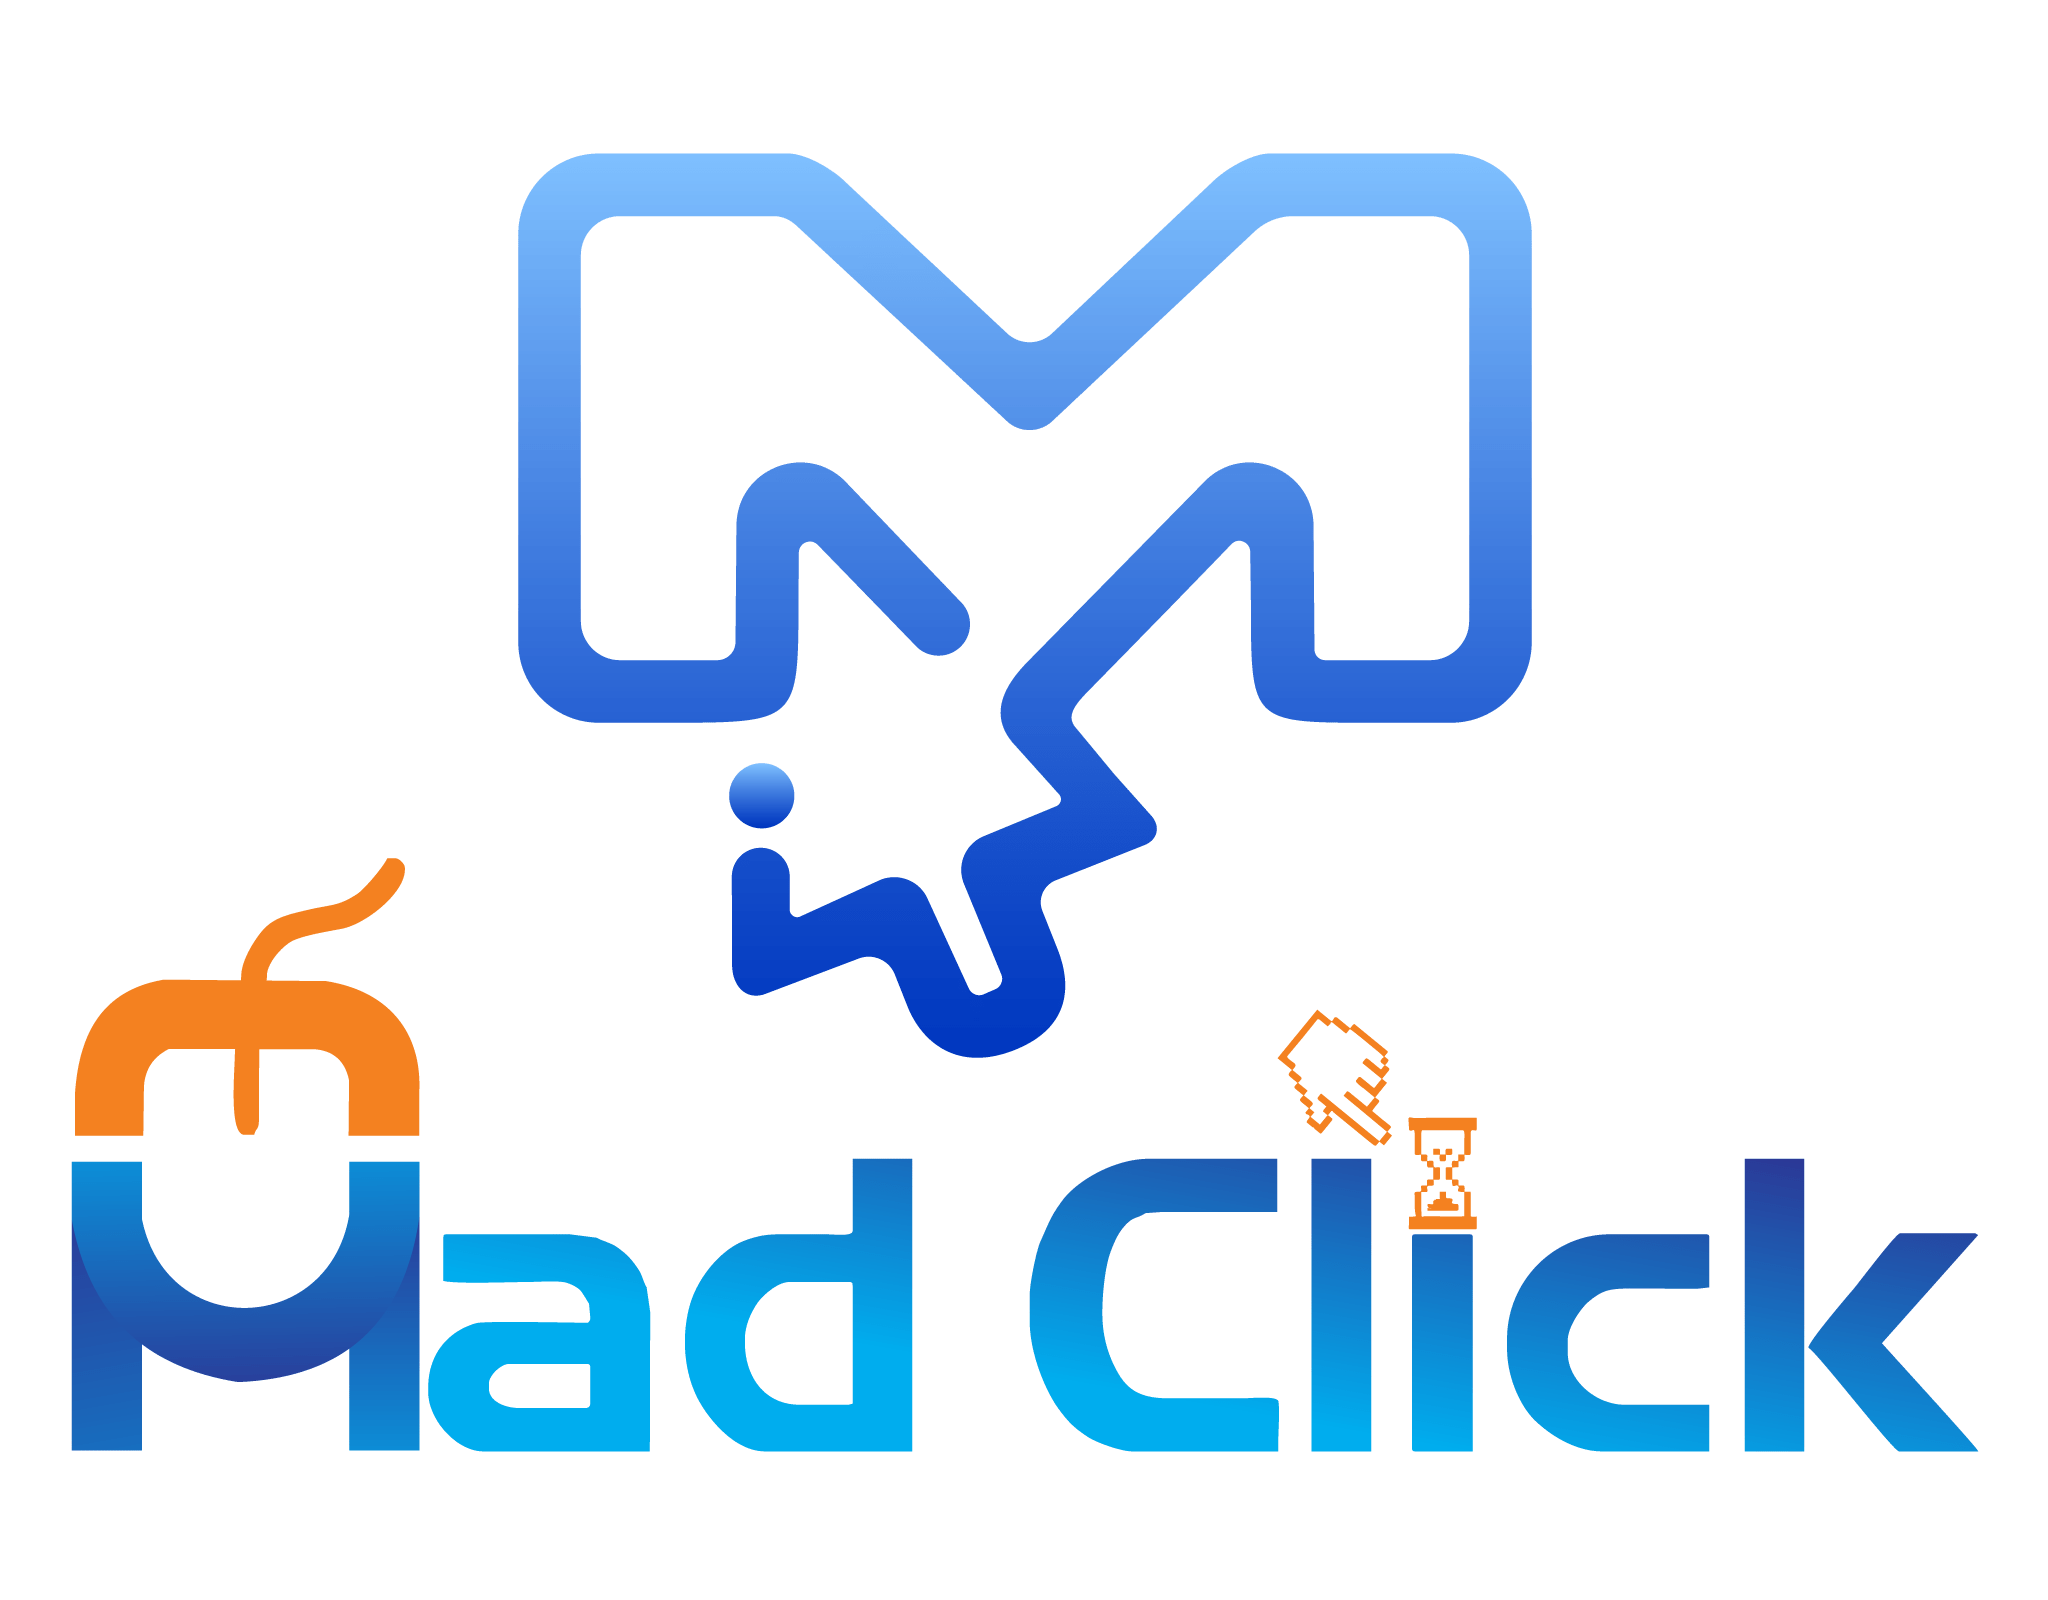 Mad Click logo